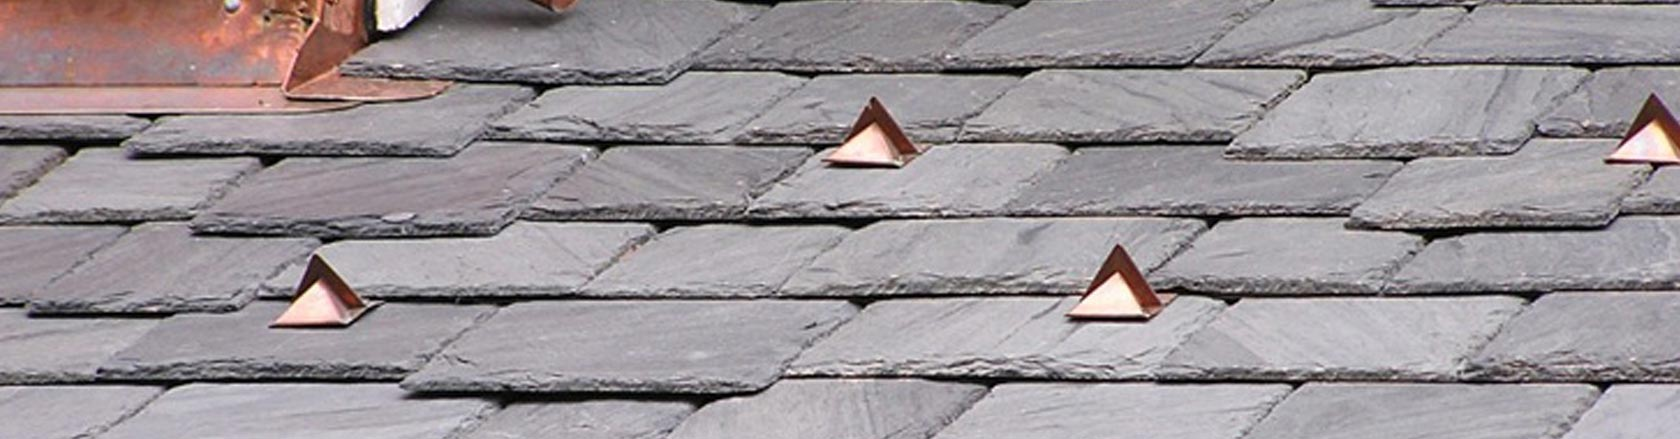 Free Lightweight Slate Roof Consultation